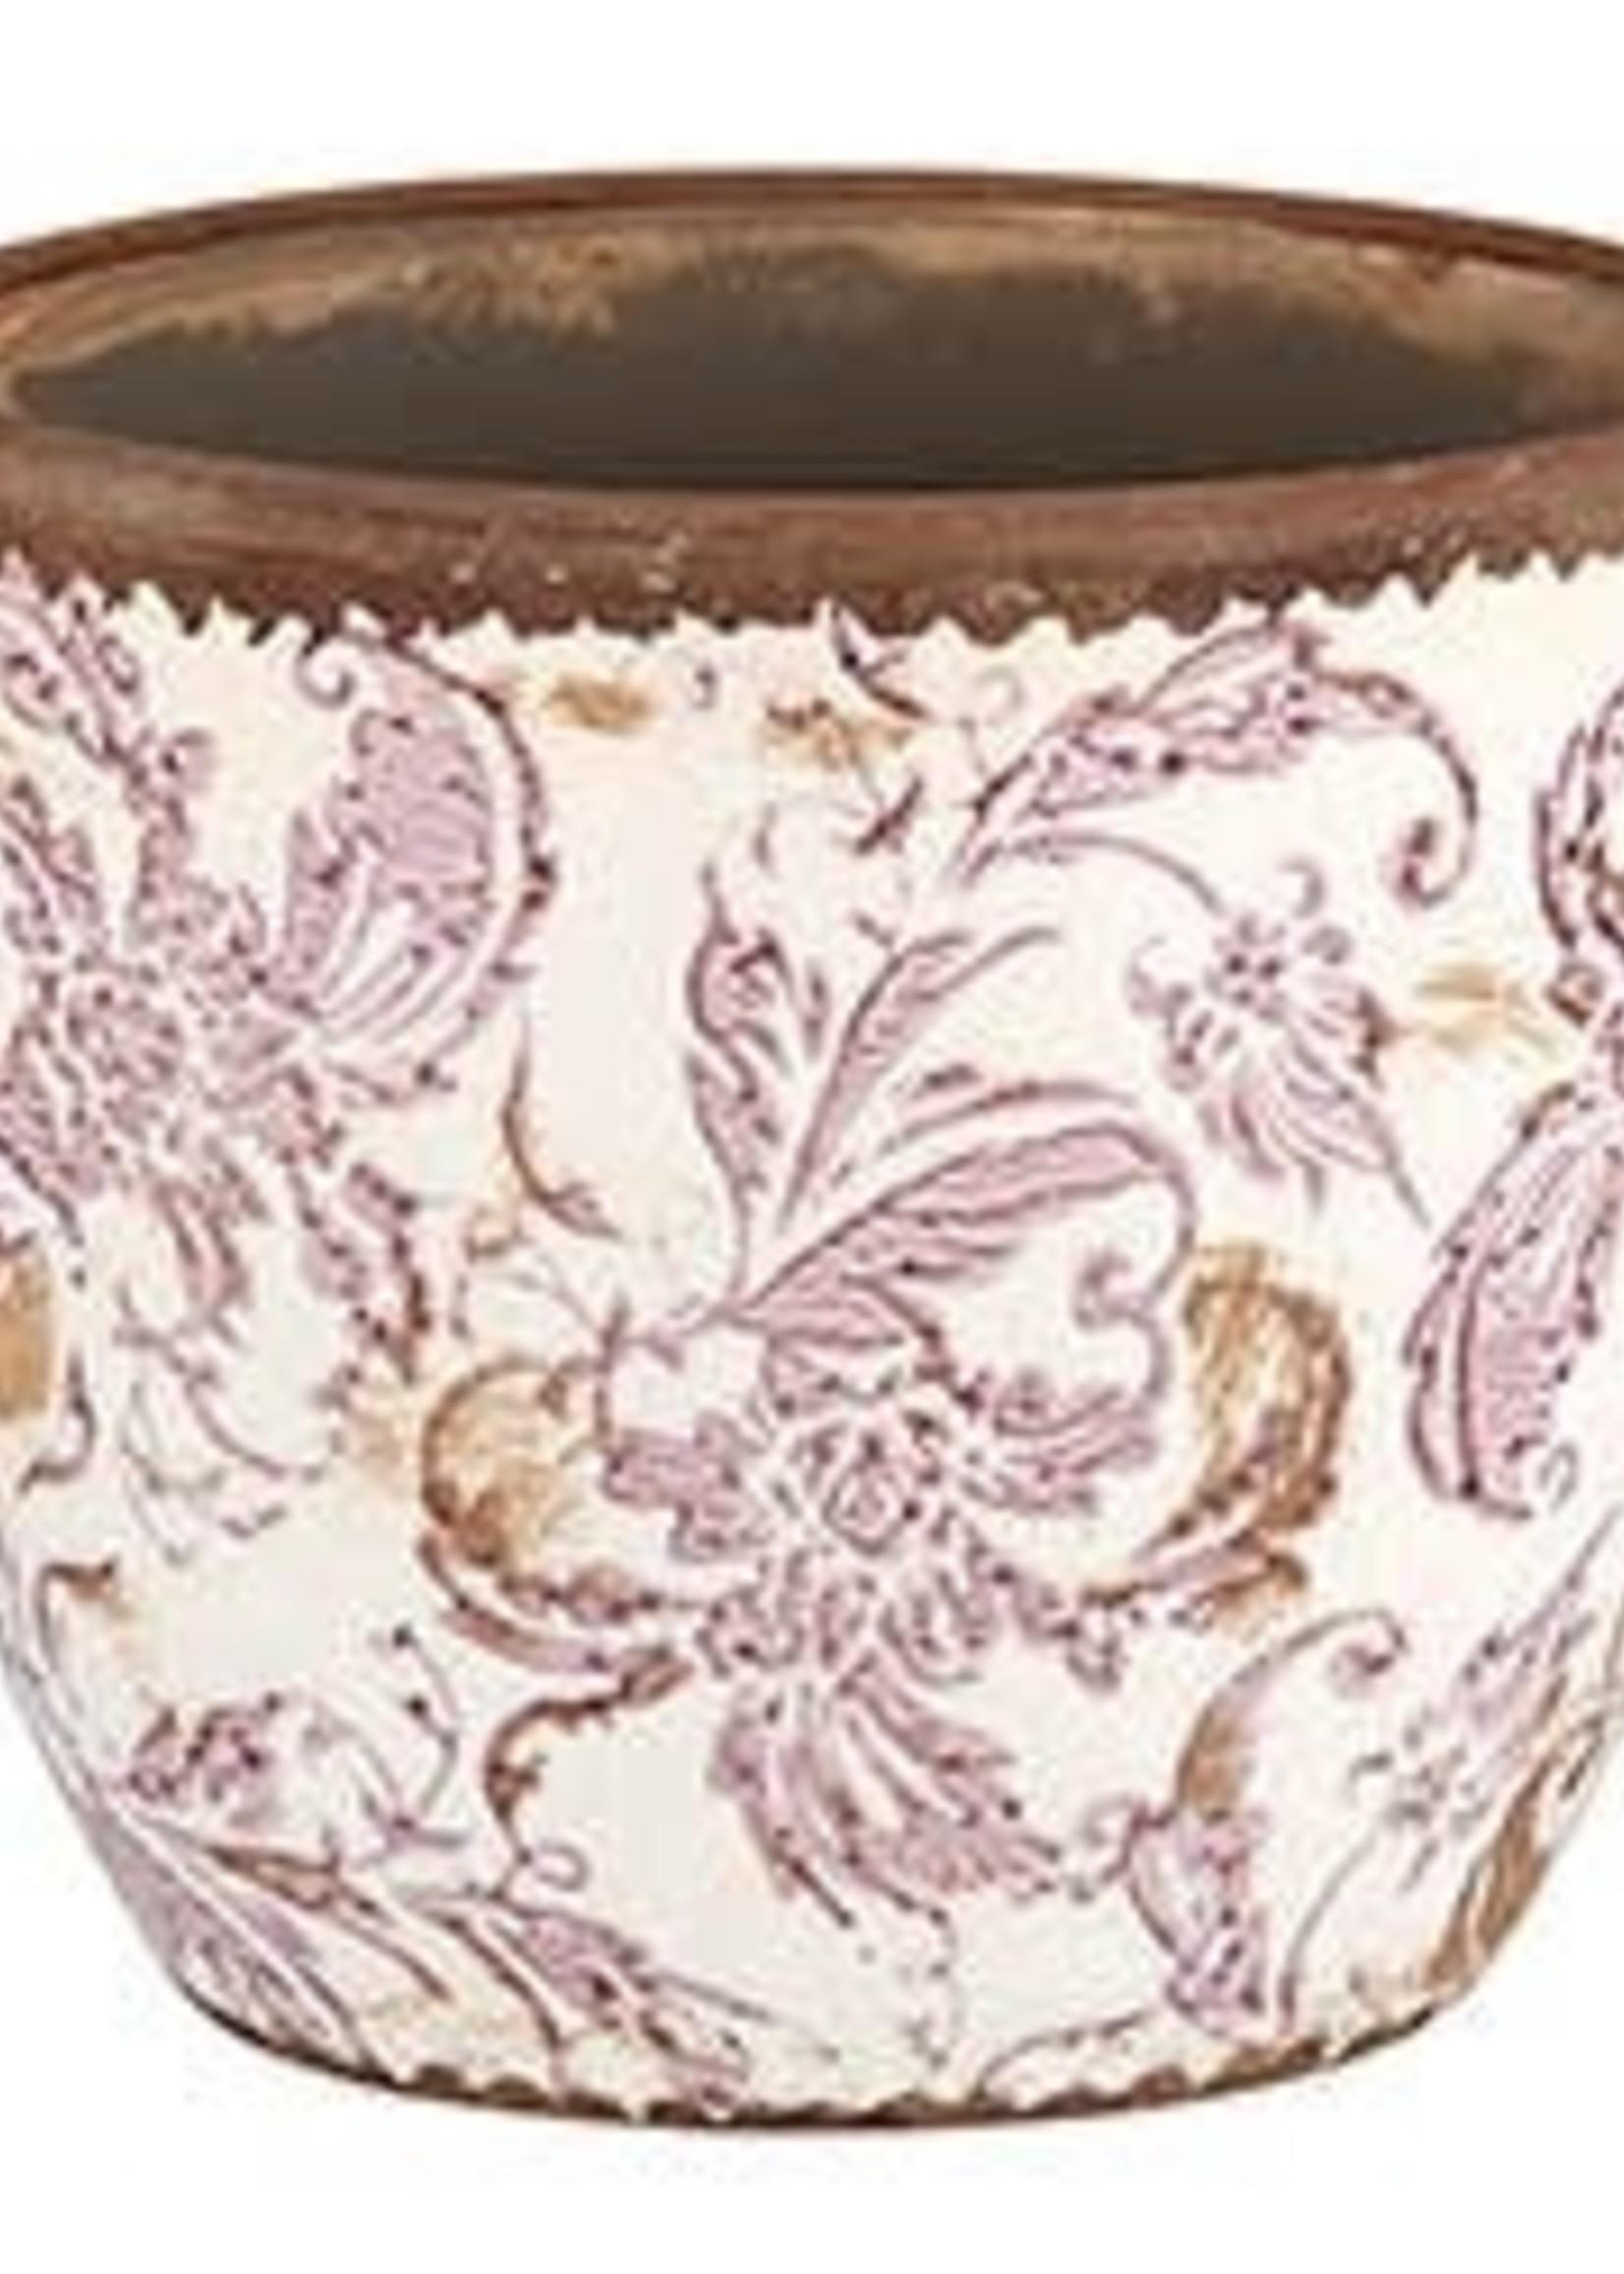 Cream And Maroon Flower Pot